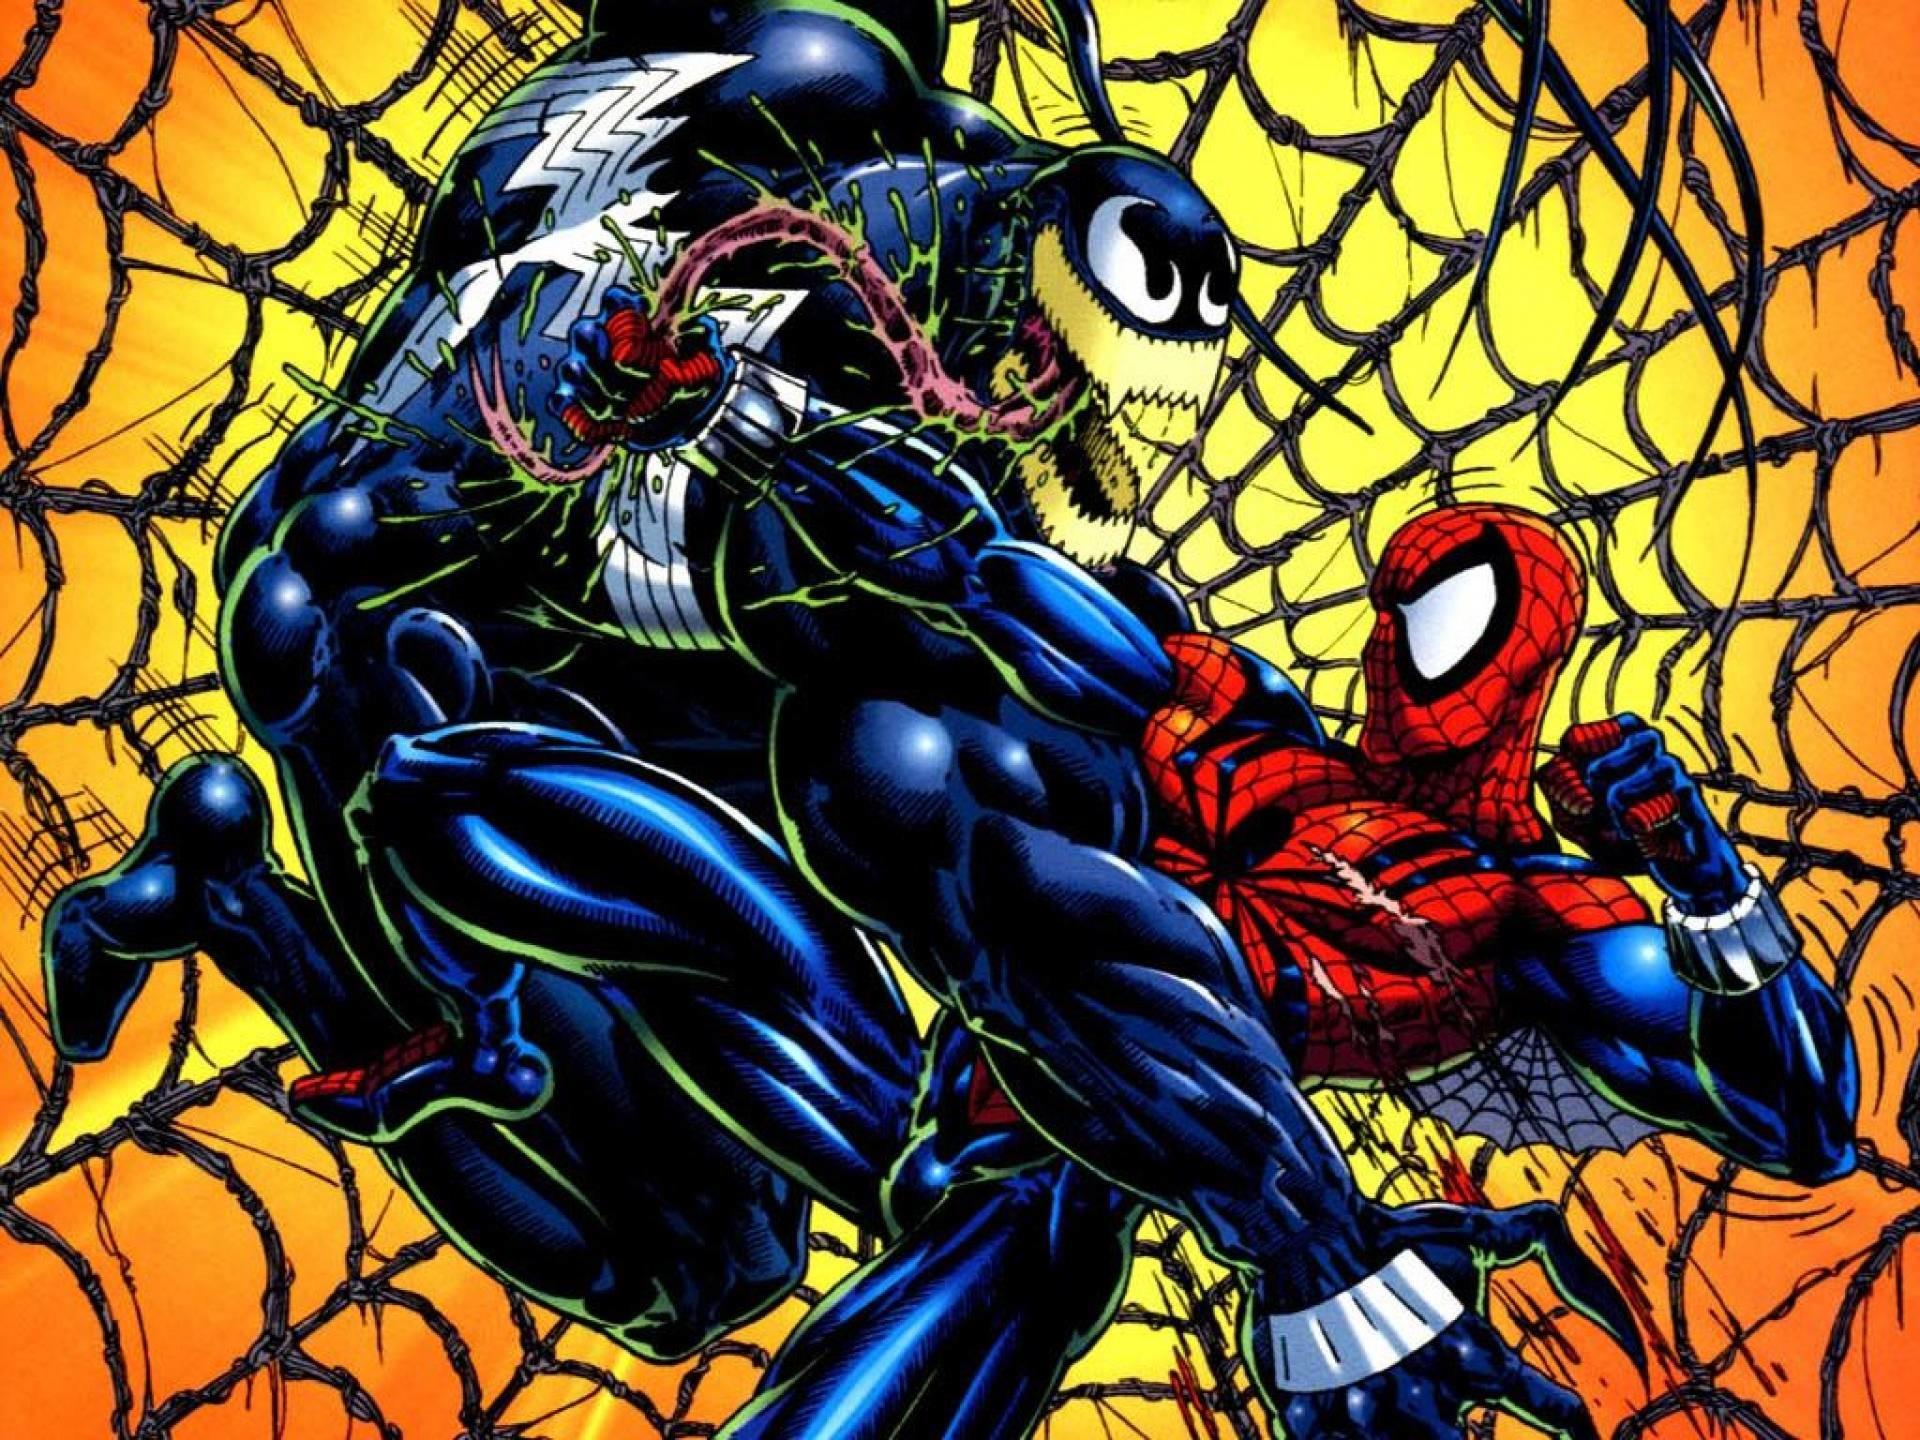 Download <b>Wallpaper</b> 1920×1080 <b>Venom</